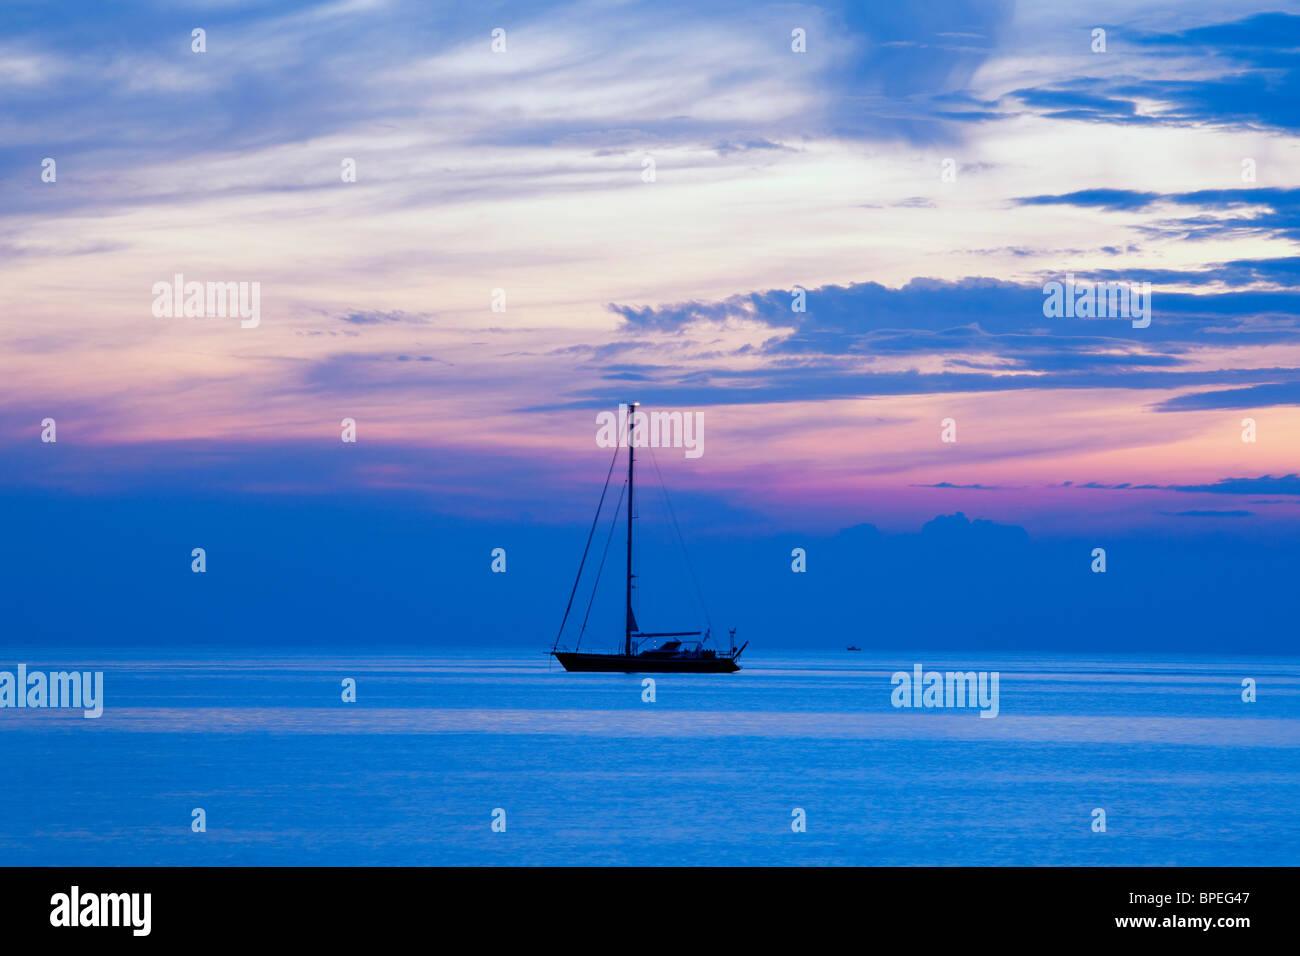 croatia, adriatic sea - anchored sailboat at dusk - Stock Image